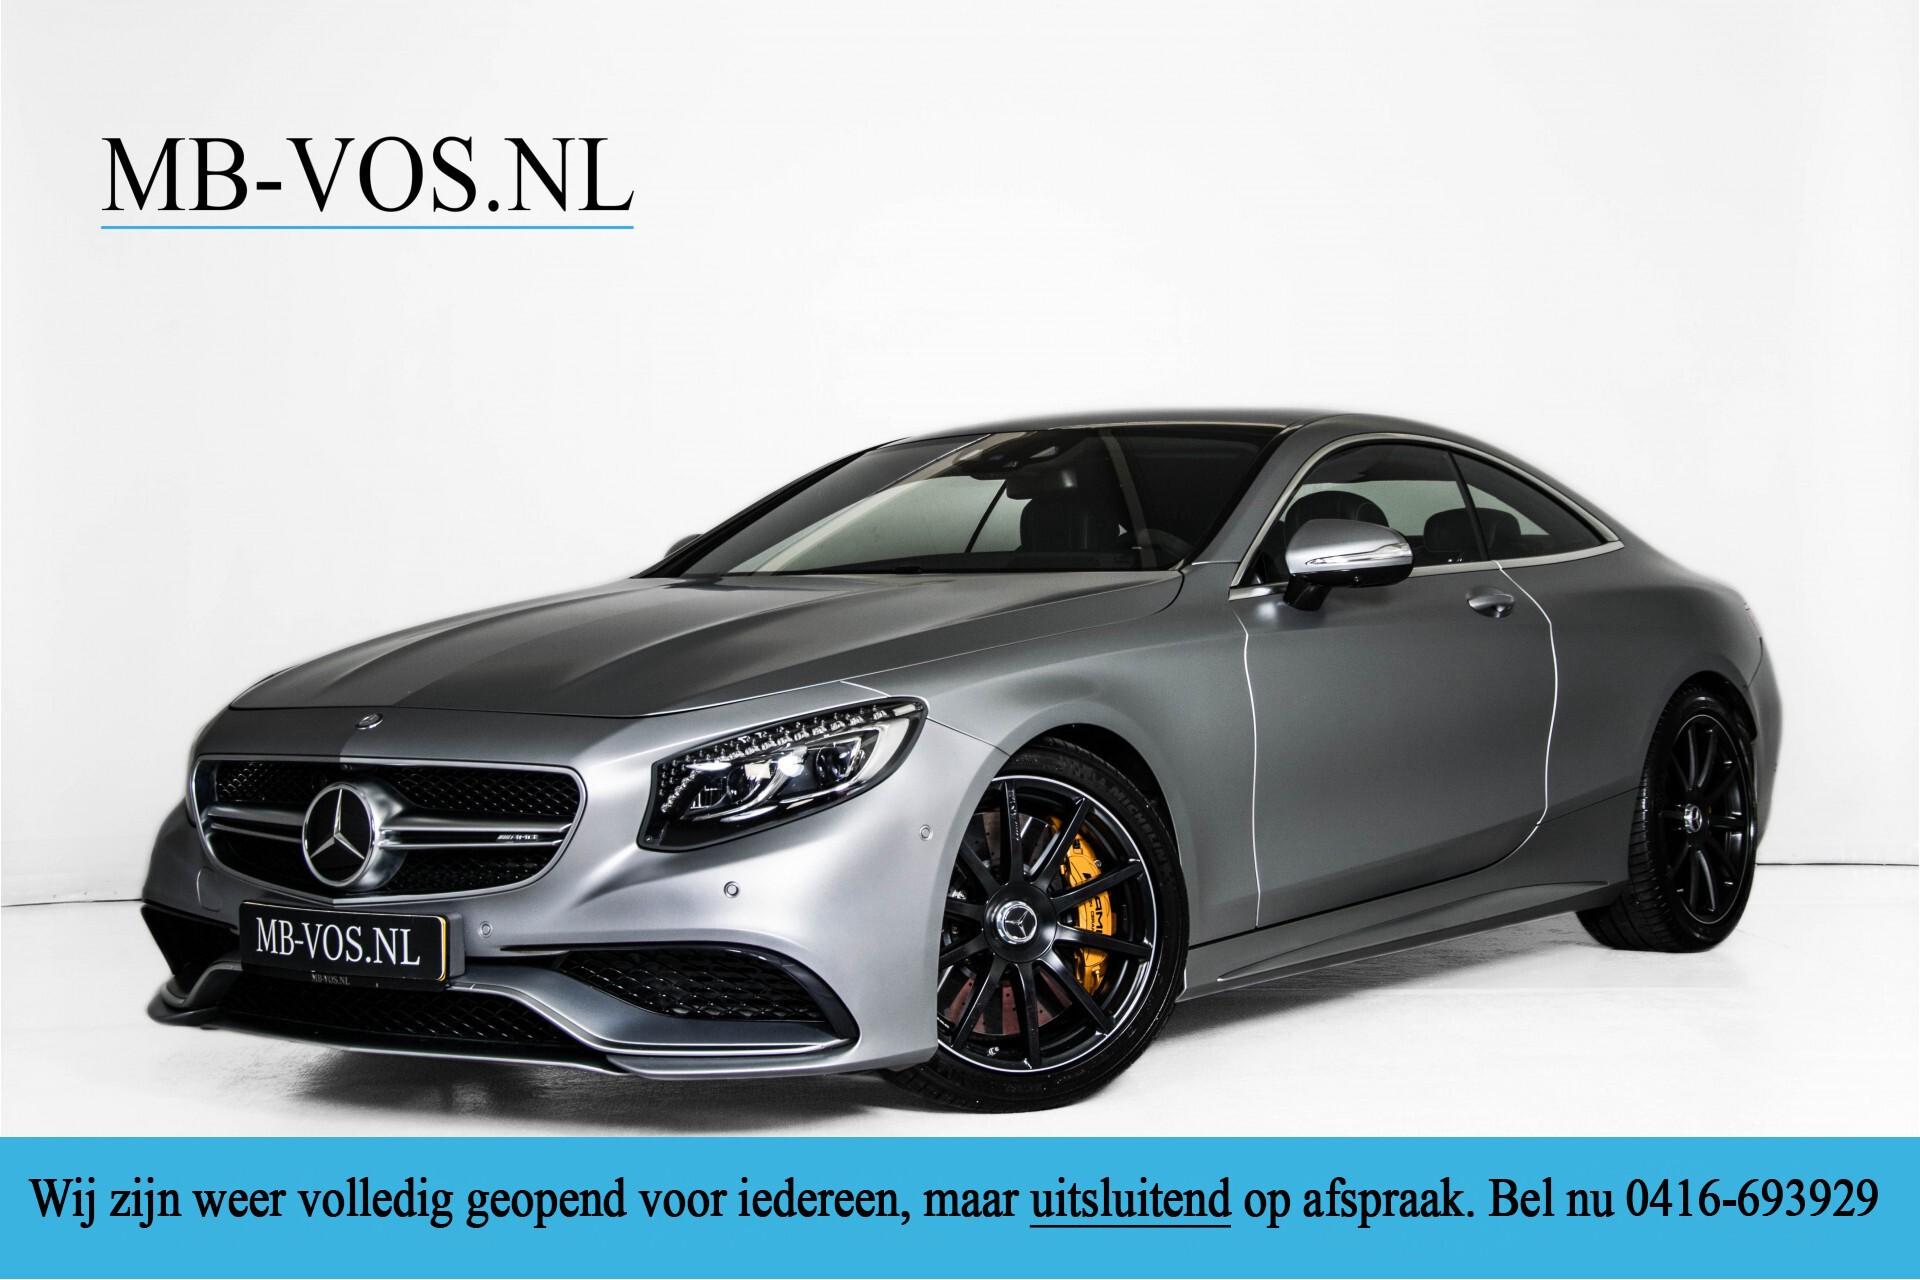 Mercedes-Benz S-Klasse Coupé 63 AMG 4-M Ceramic/Akrapovic/Swarowski/Designo/Burmester High End Aut7 Foto 1